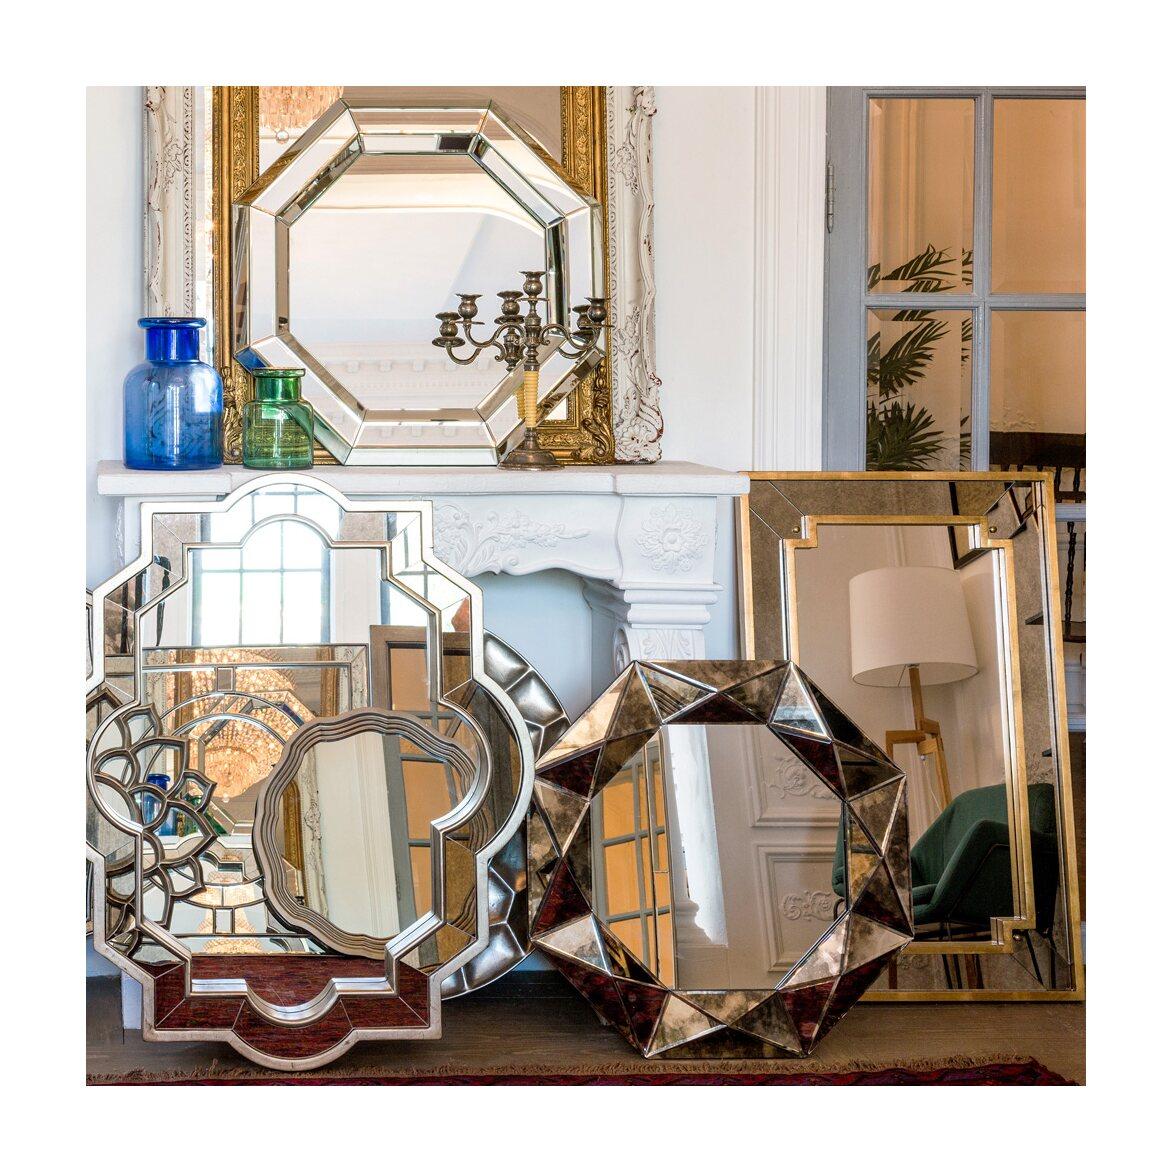 Настенное зеркало «Саттон» 5 | Настенные зеркала Kingsby